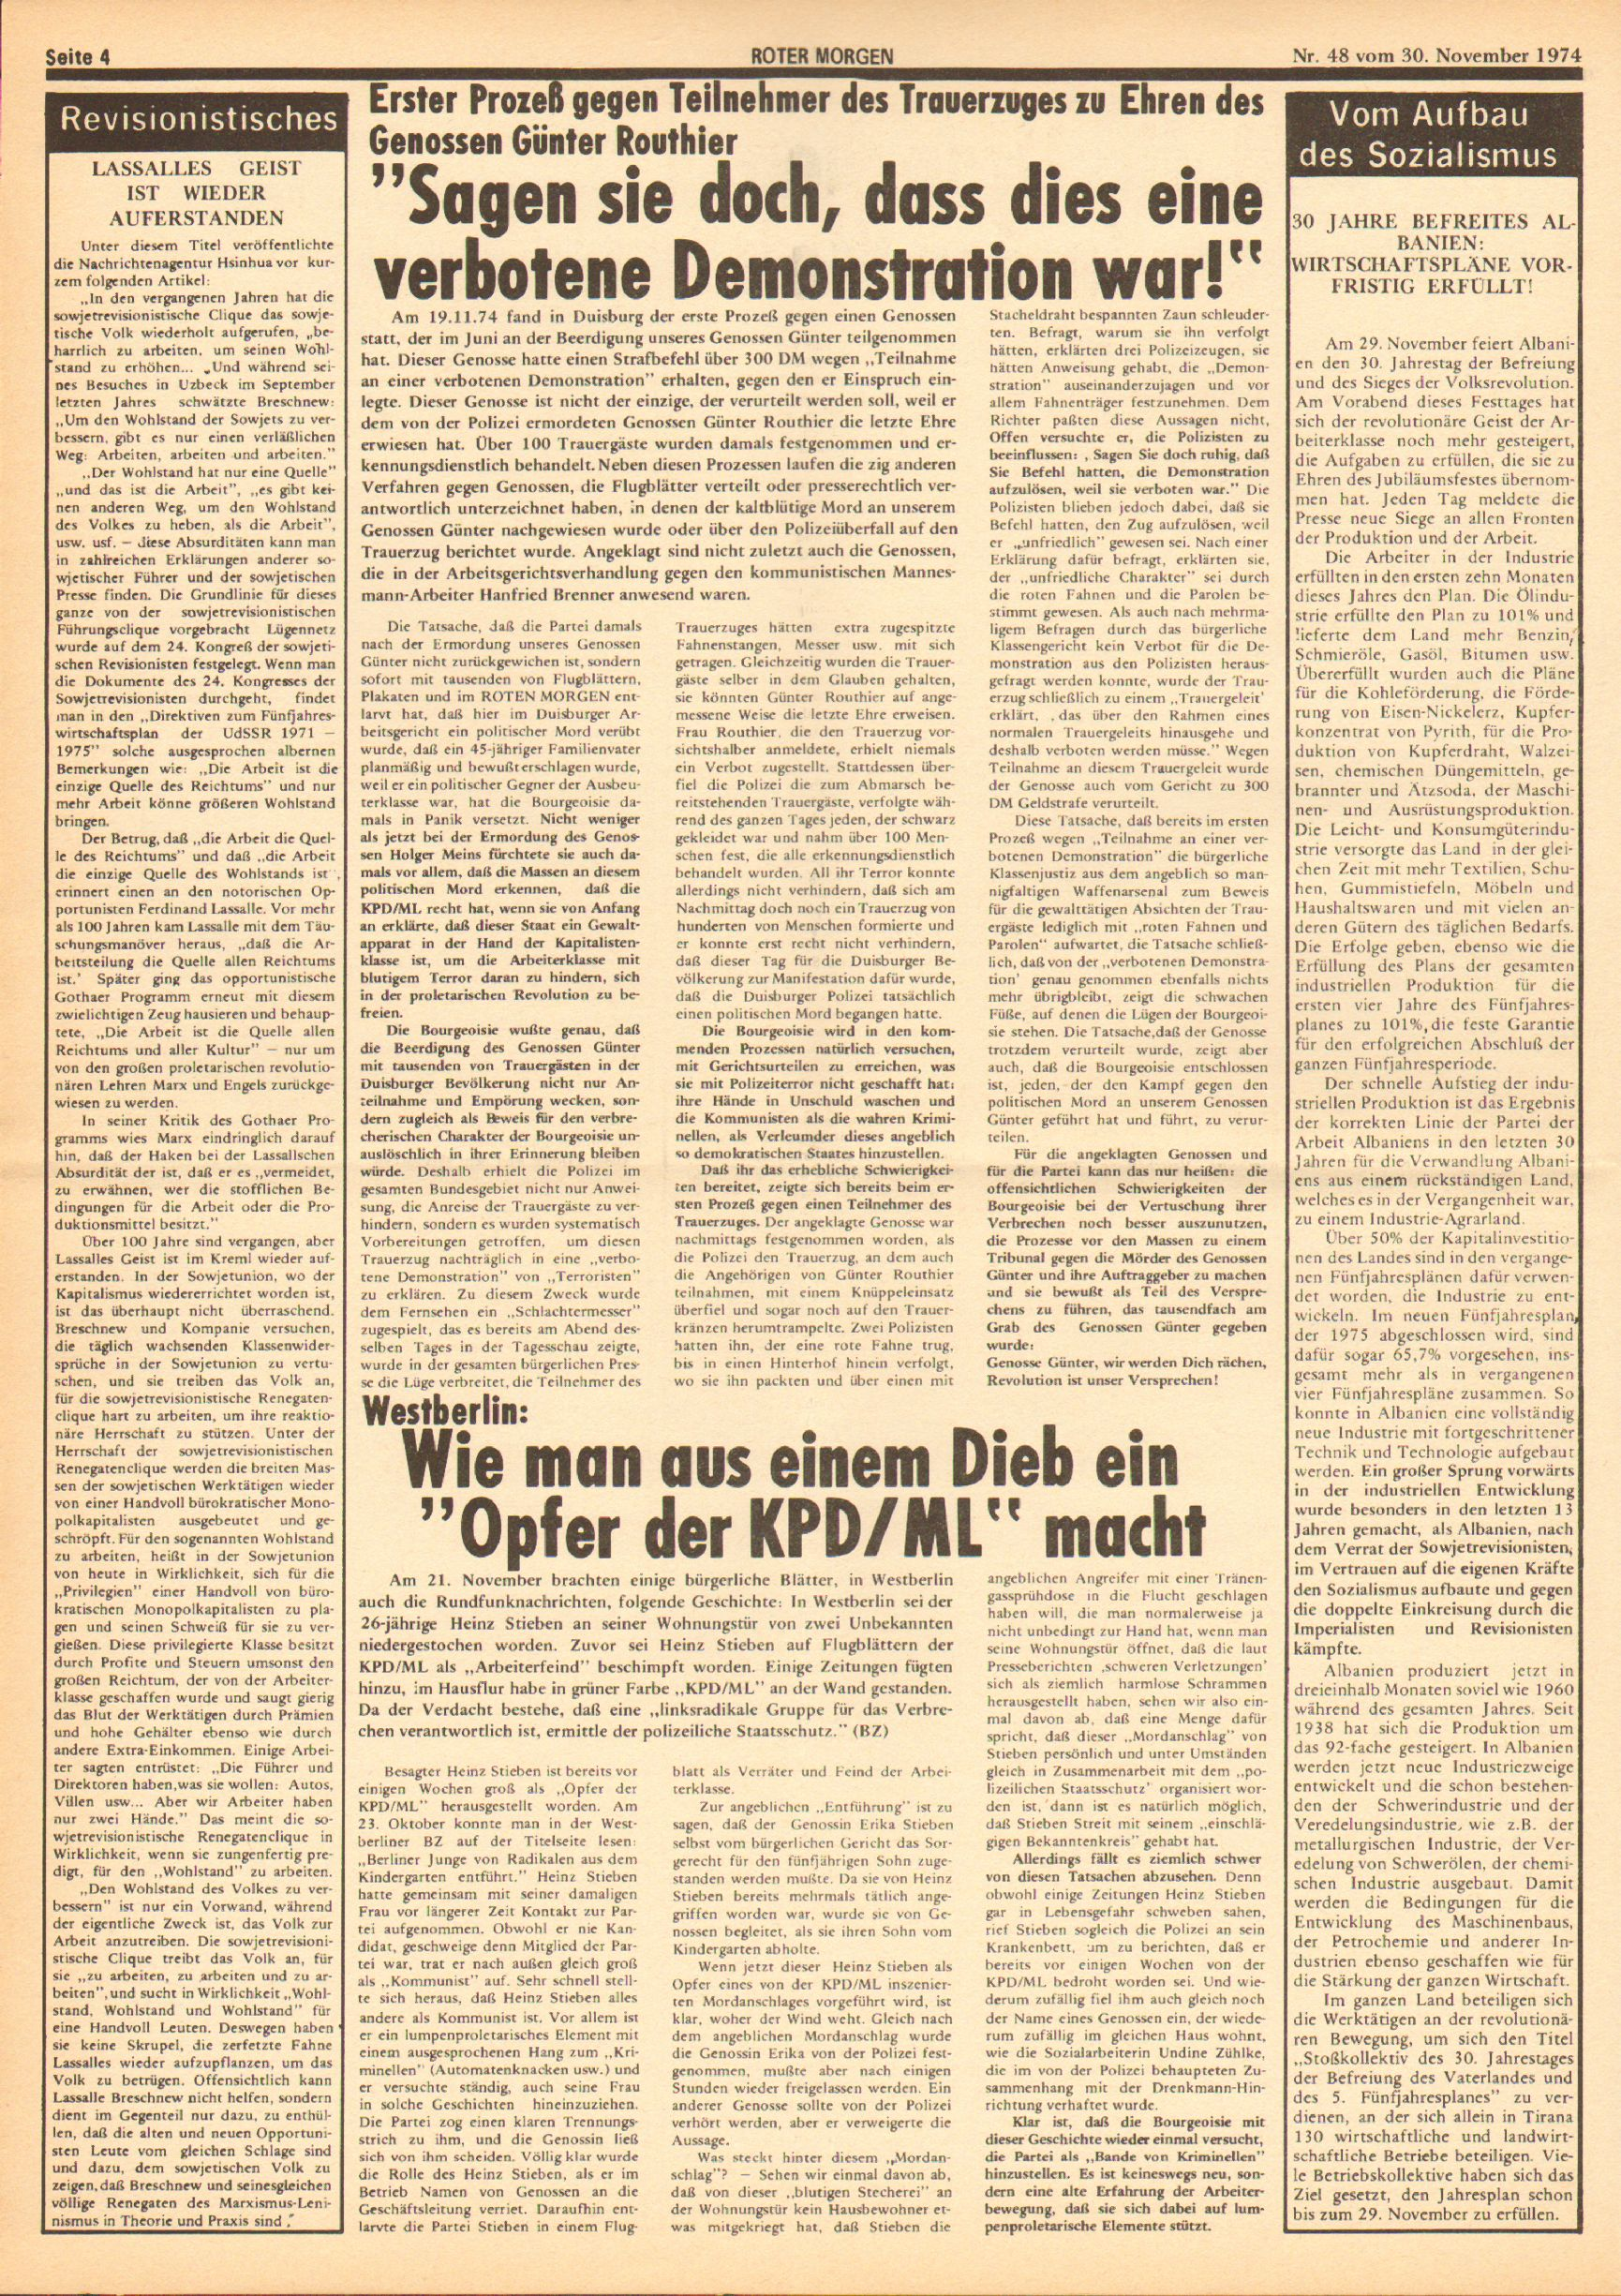 Roter Morgen, 8. Jg., 30. November 1974, Nr. 48, Seite 4